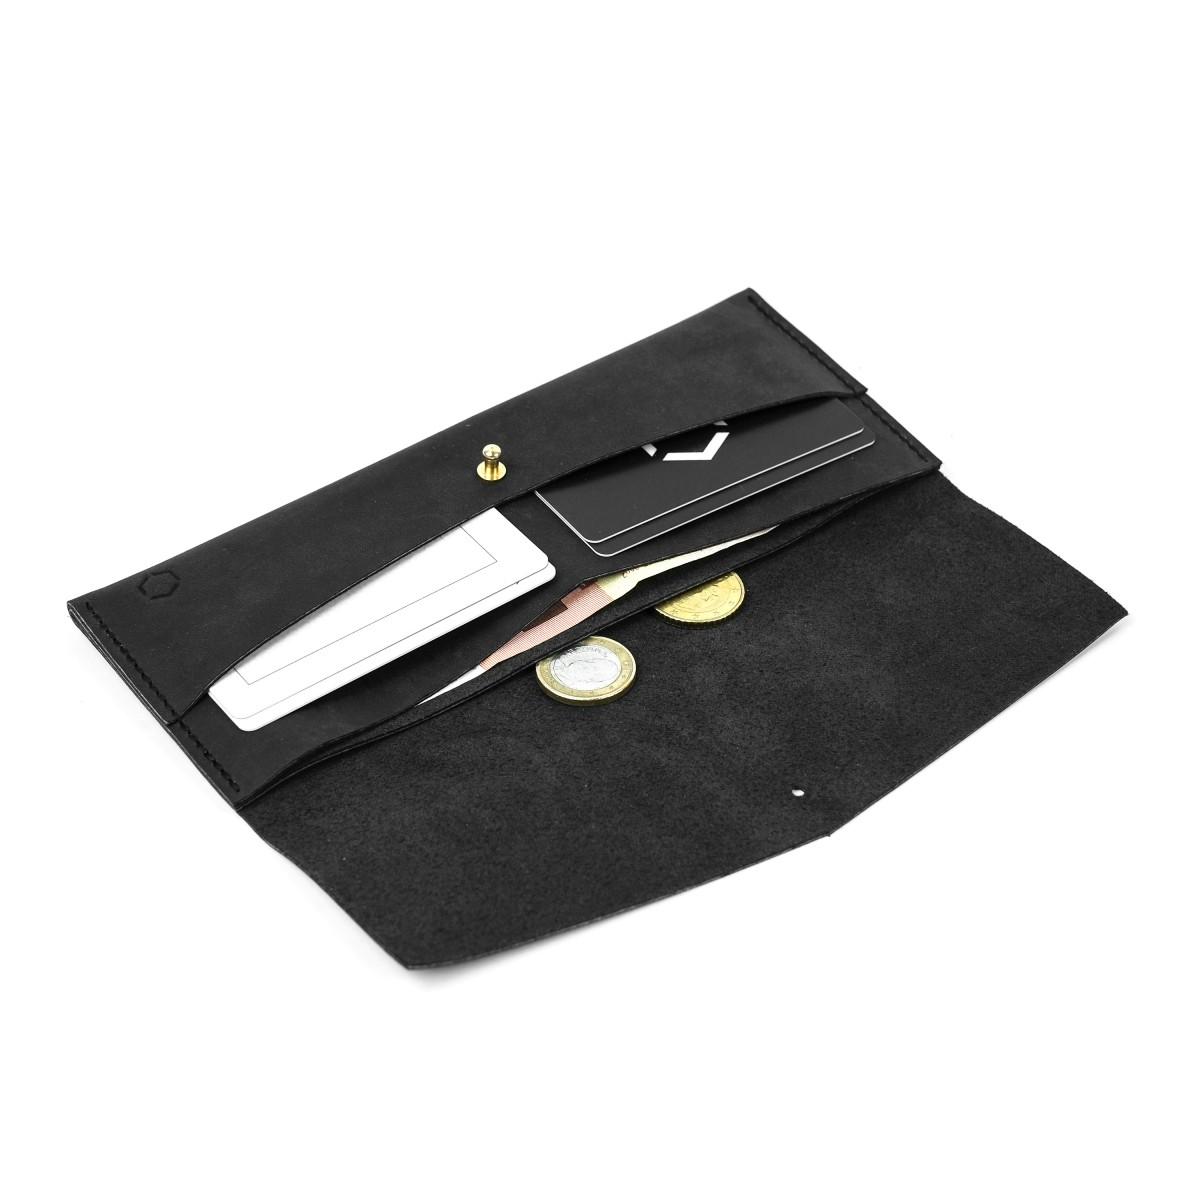 HOCH3 ELISE Portemonnaie | schwarzes Leder